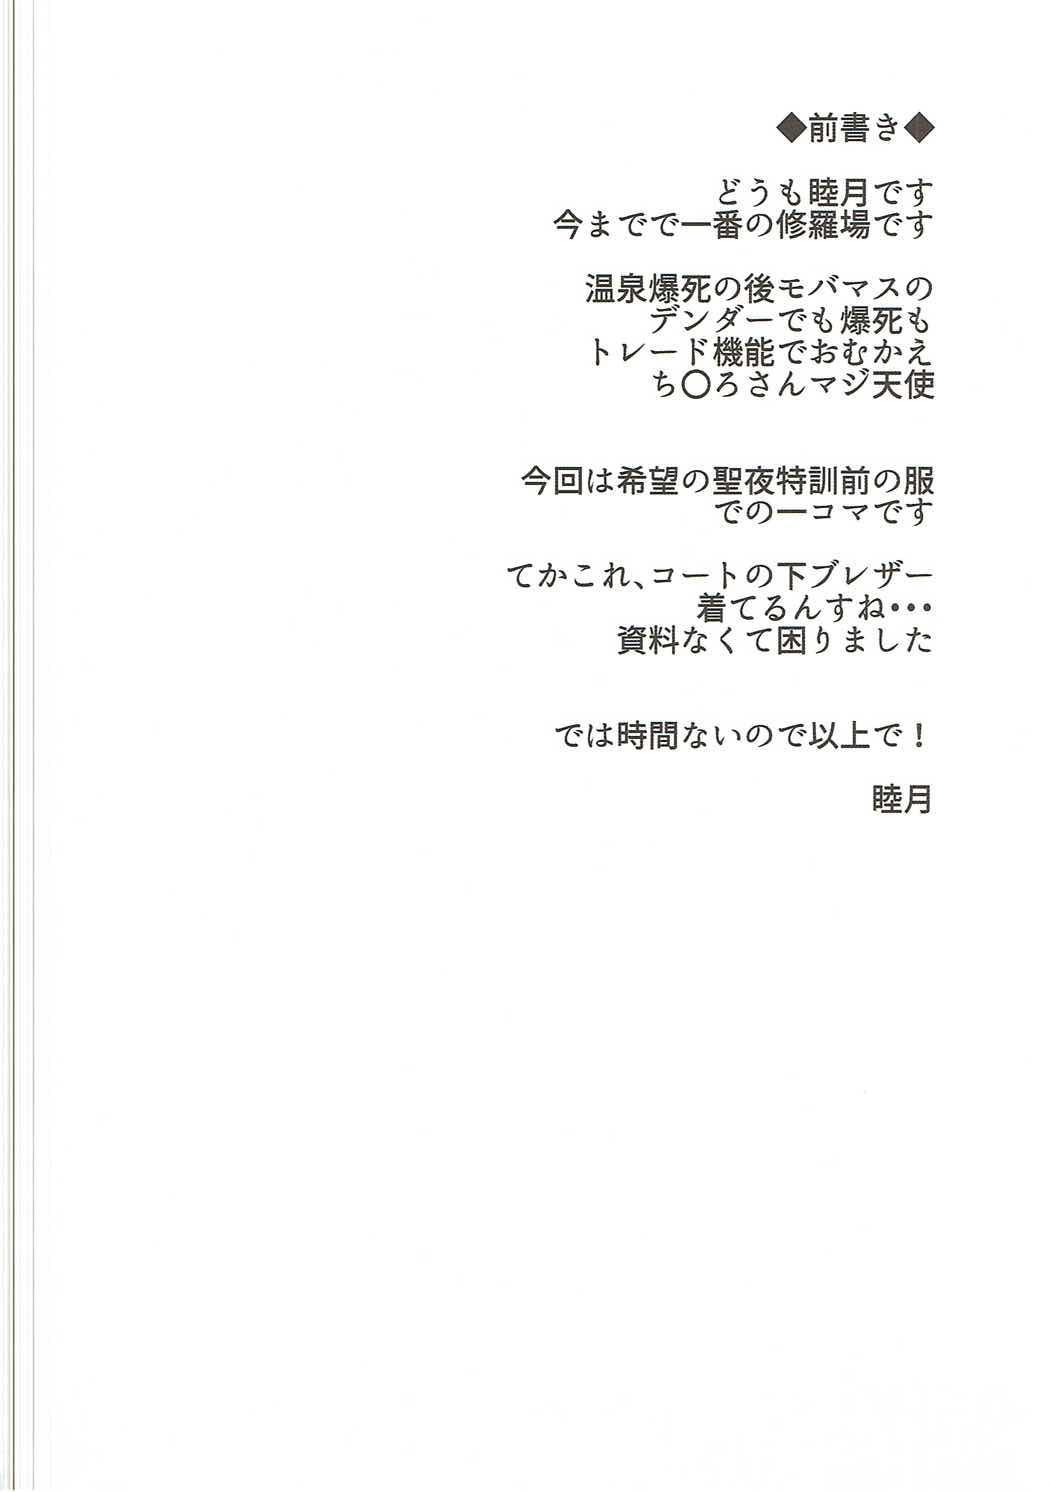 Koiiro Karen 2 2